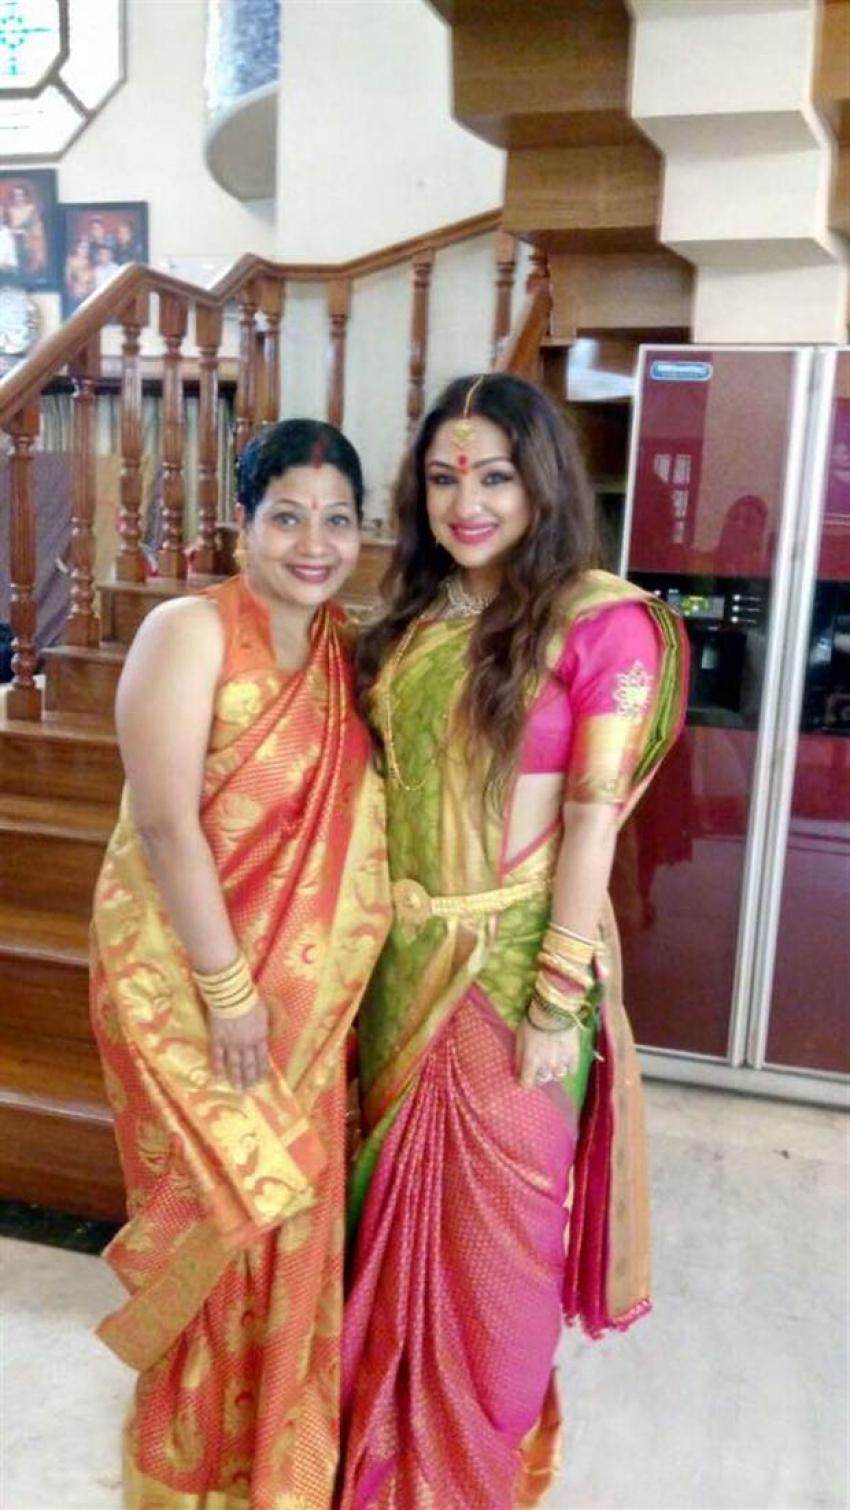 Varamahalakshmi Festival Celebration In Actress Priyanka Upendra House Photos